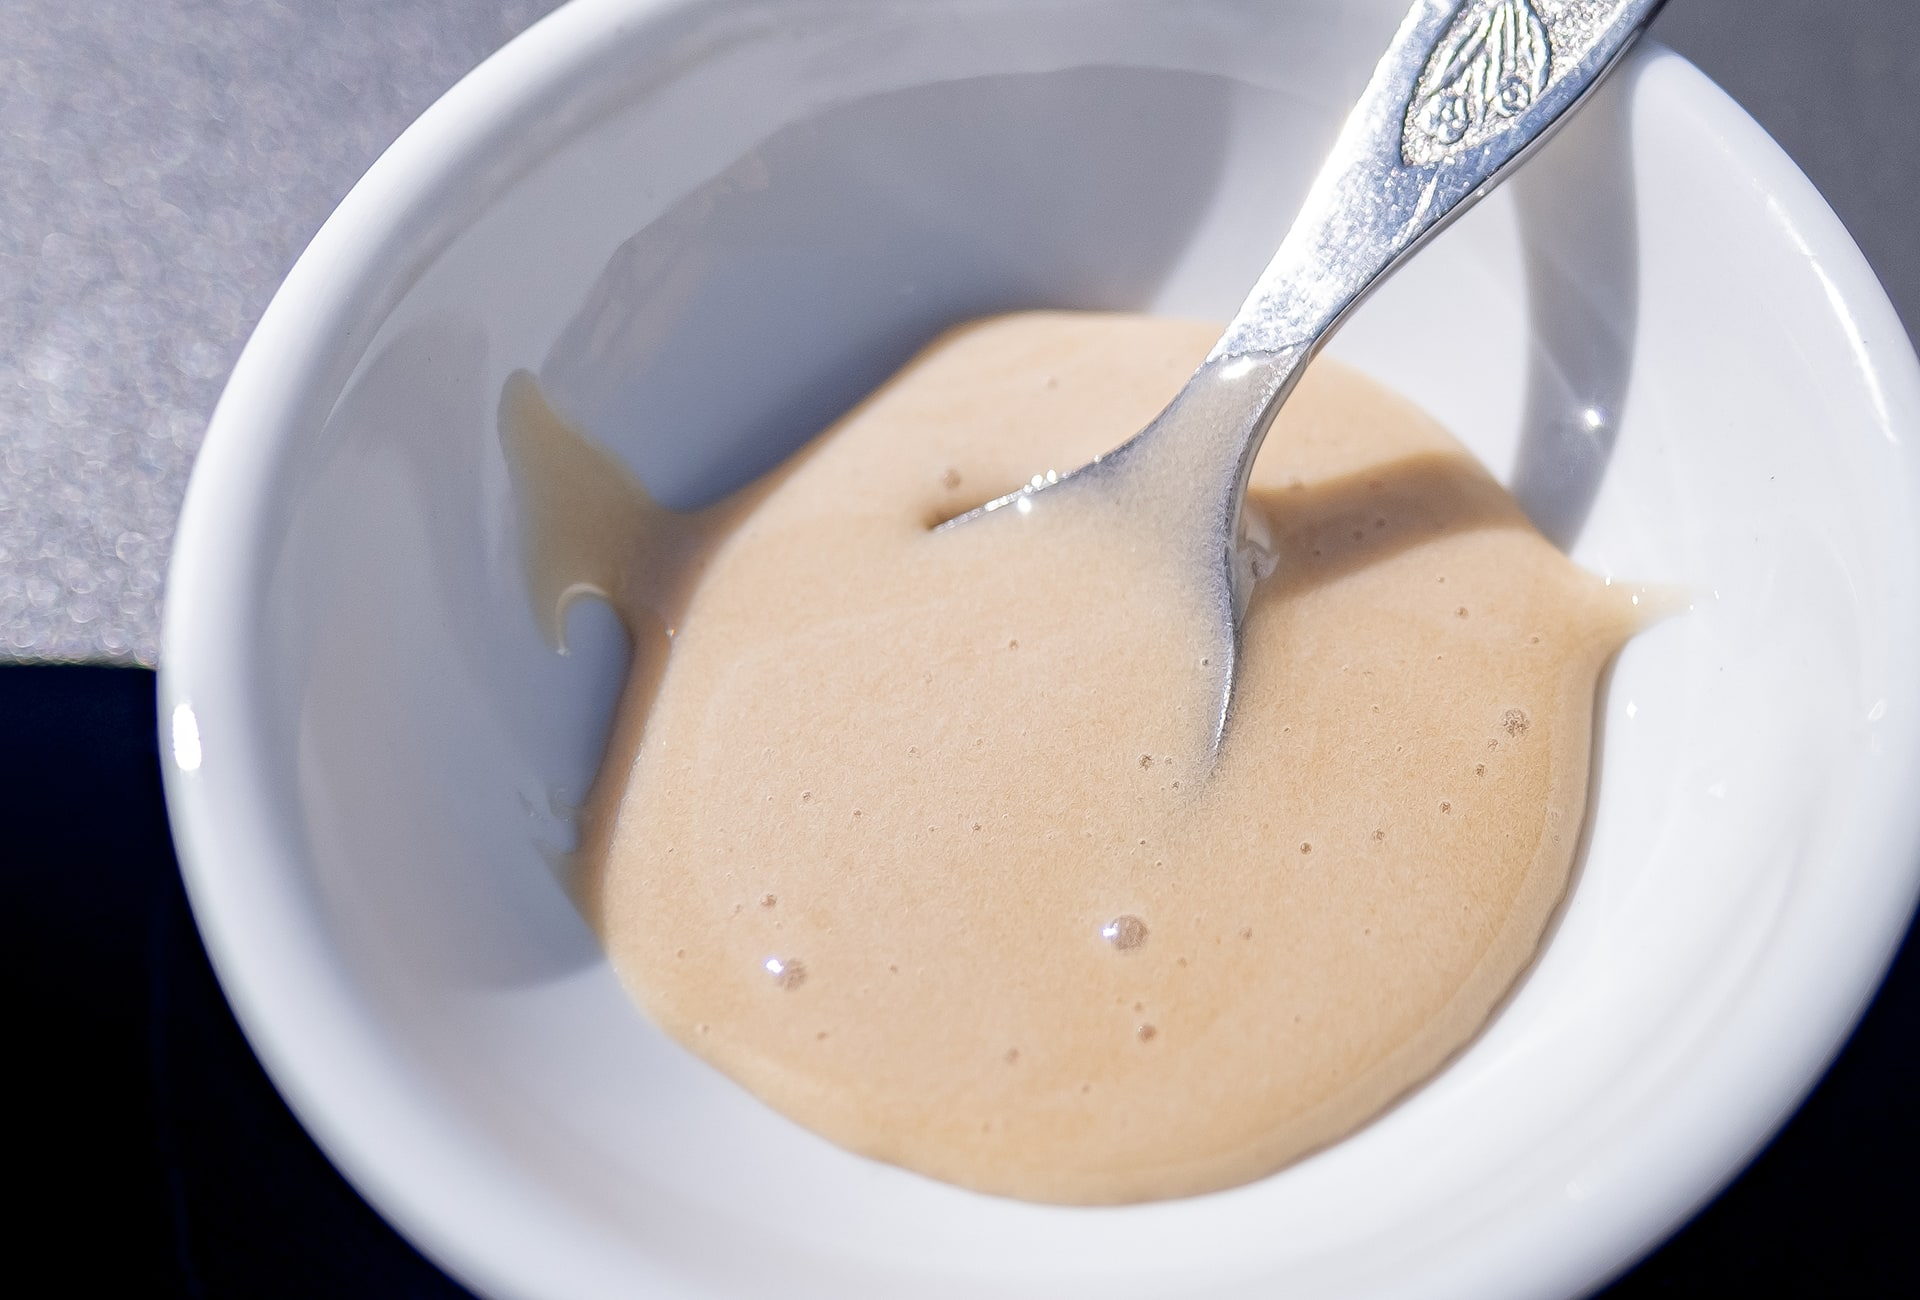 Miel crema